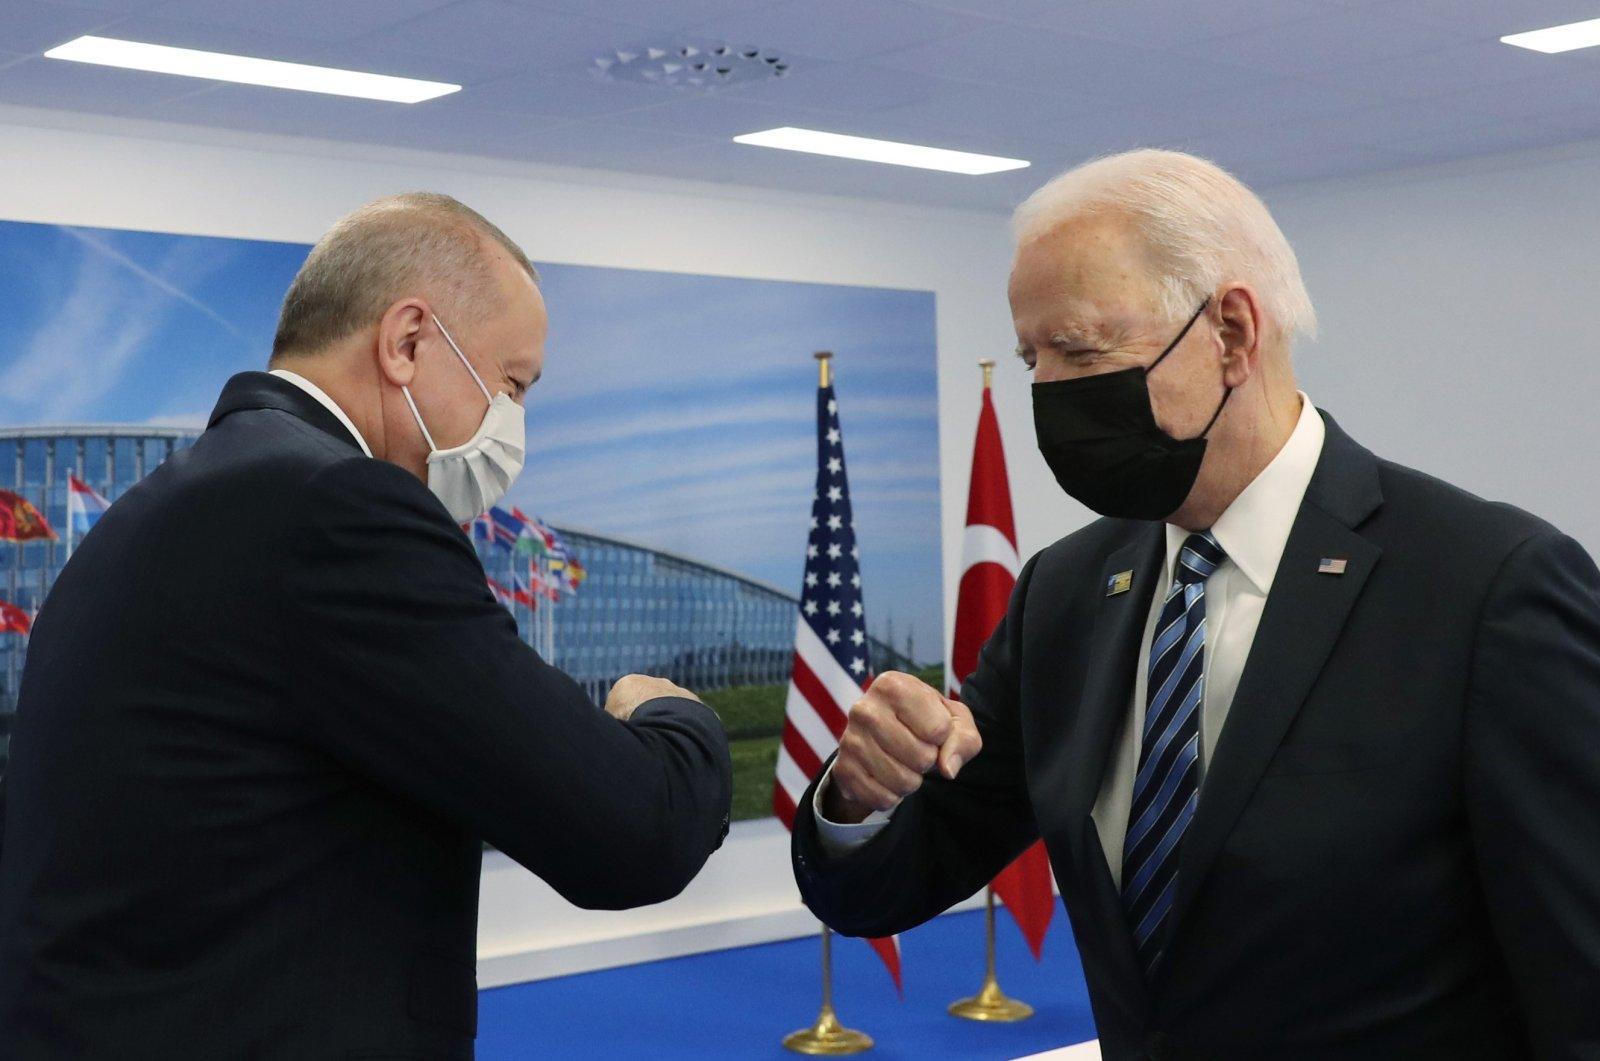 President Recep Tayyip Erdoğan and U.S. President Joe Biden greet each other in Brussels, Belgium, June 14, 2021. (IHA Photo)